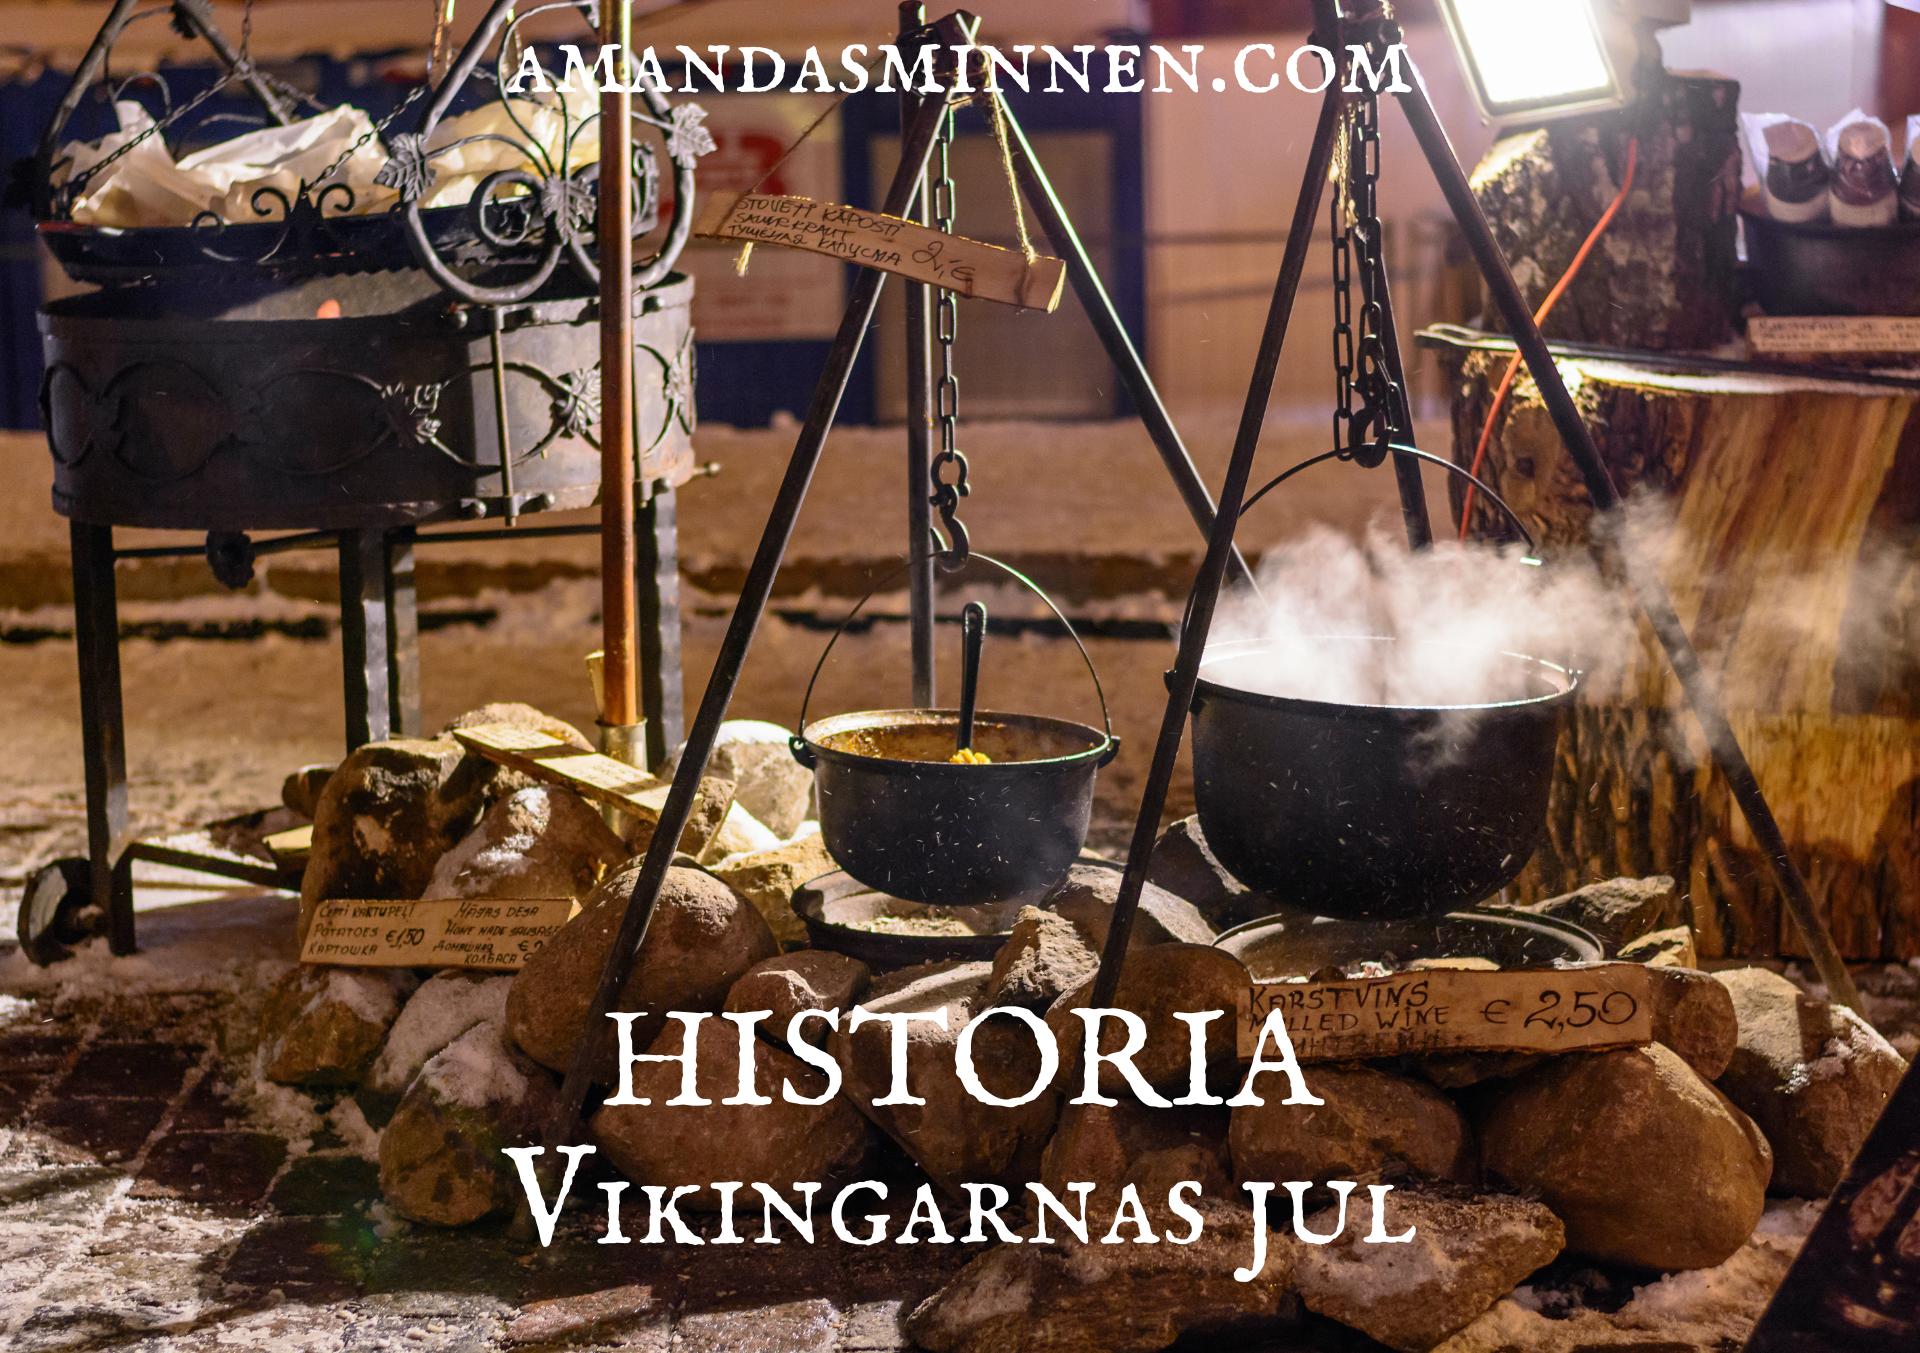 vikingarnas jul 3